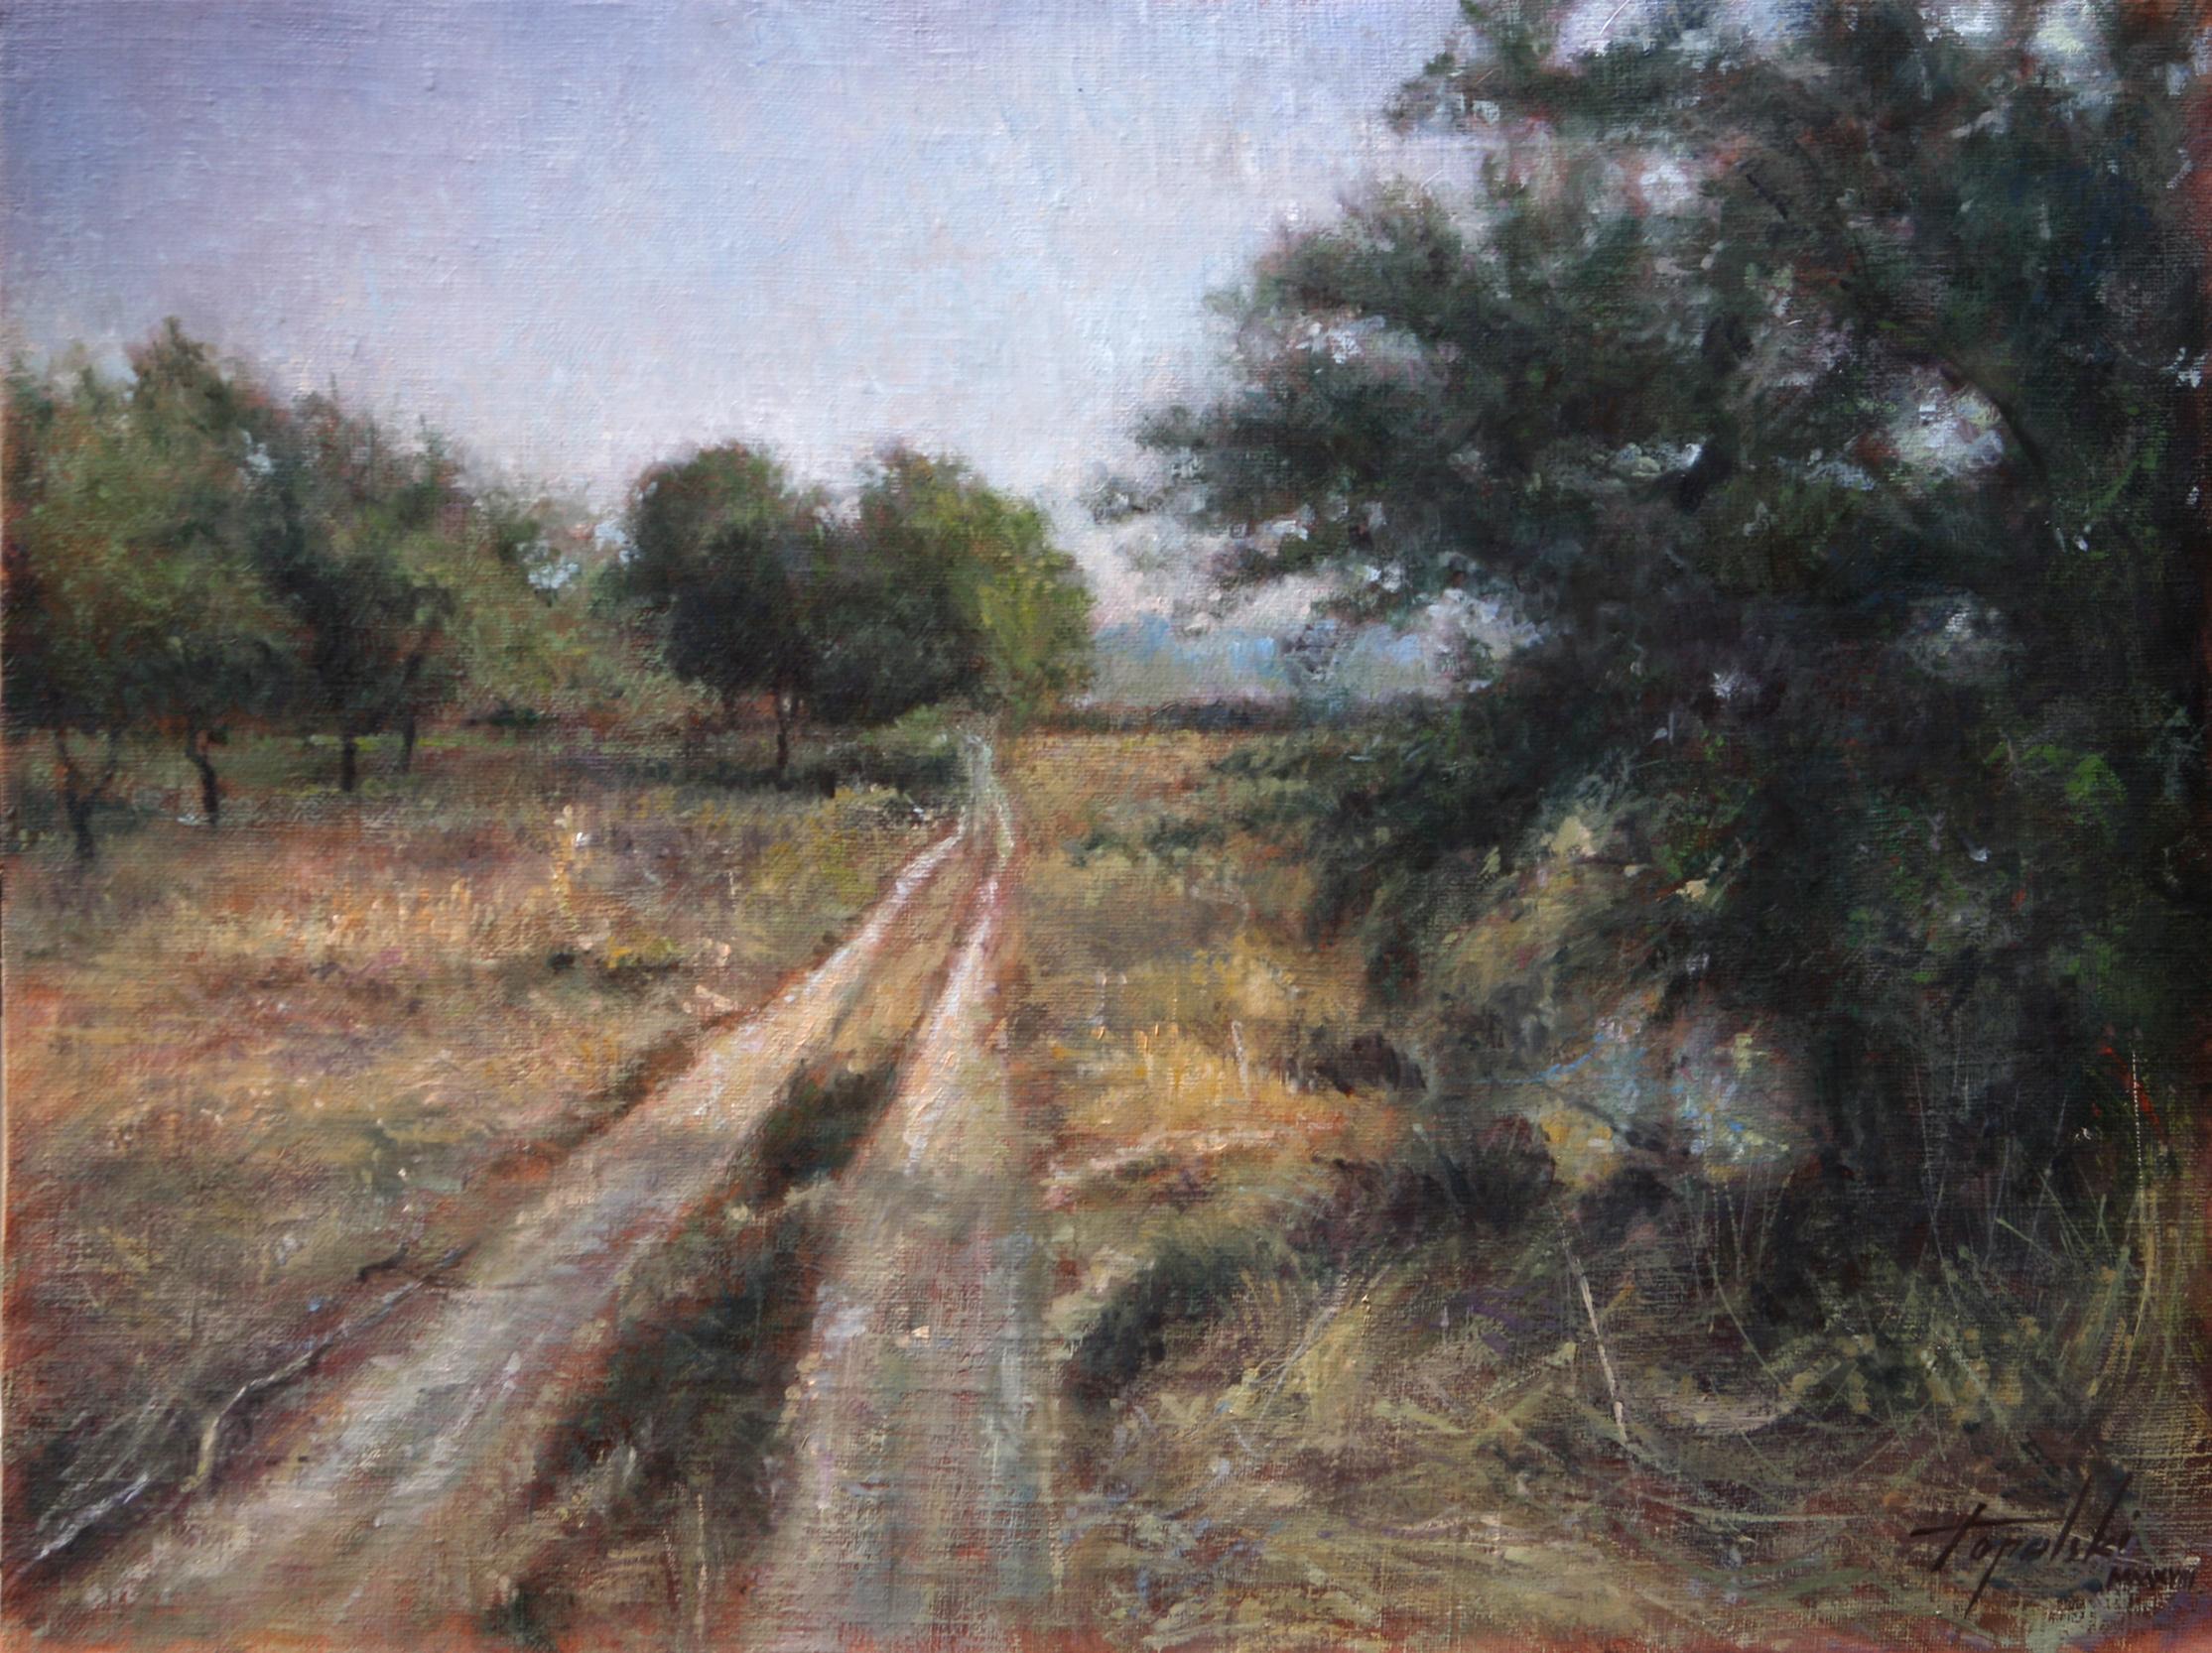 Country Road Landscape Oil Painting Fine Arts Gallery Original Fine Art Oil Paintings Watercolor Art Drawings